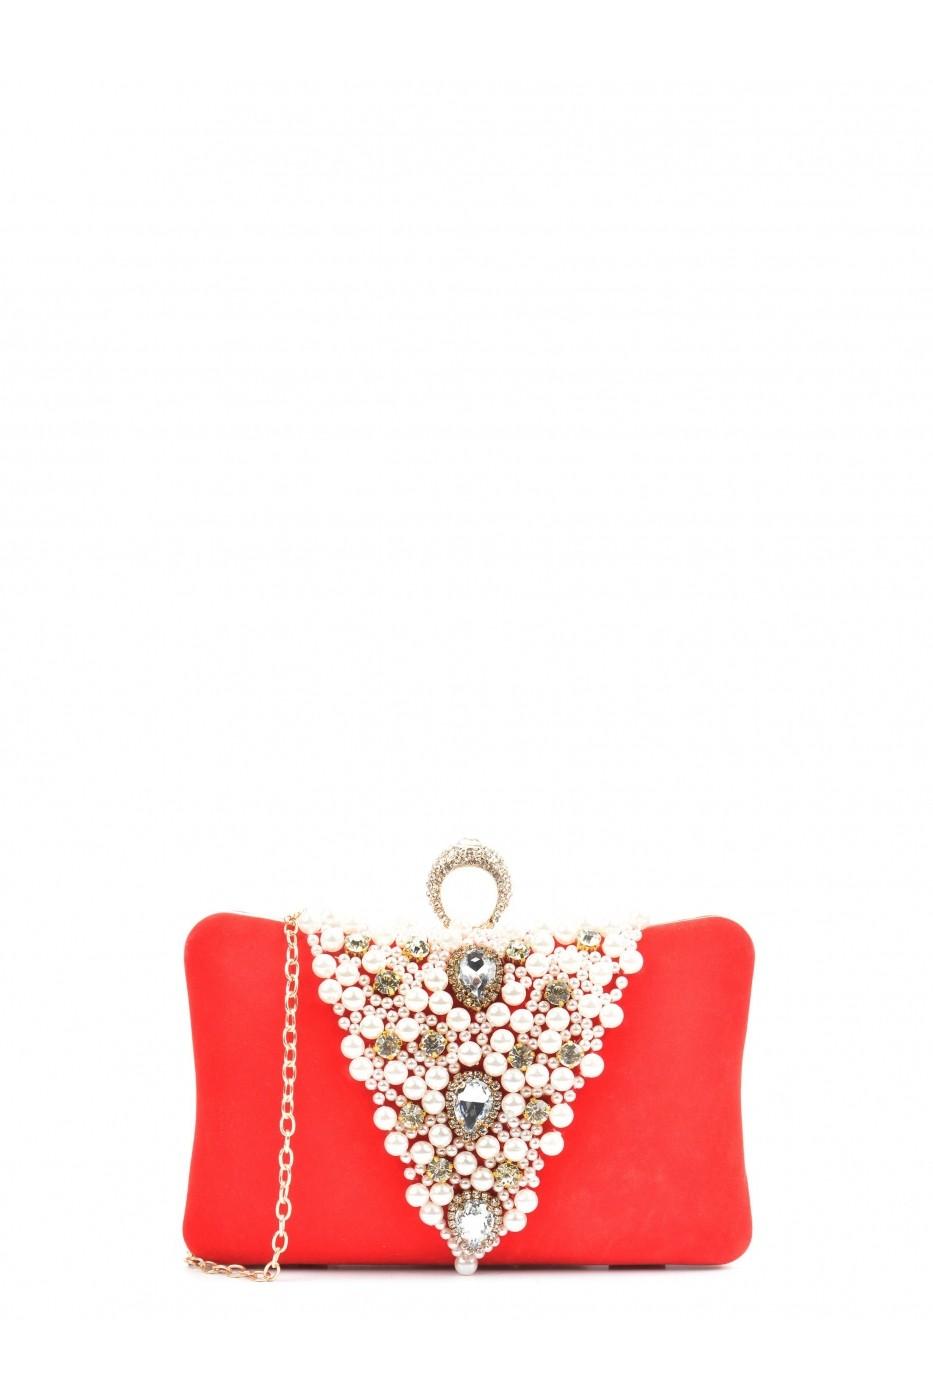 a5c4eaa71111 Carla Ferreri Borítéktáska SBV-SS18_CF_PO94-ROSSO Piros - FashionUP!